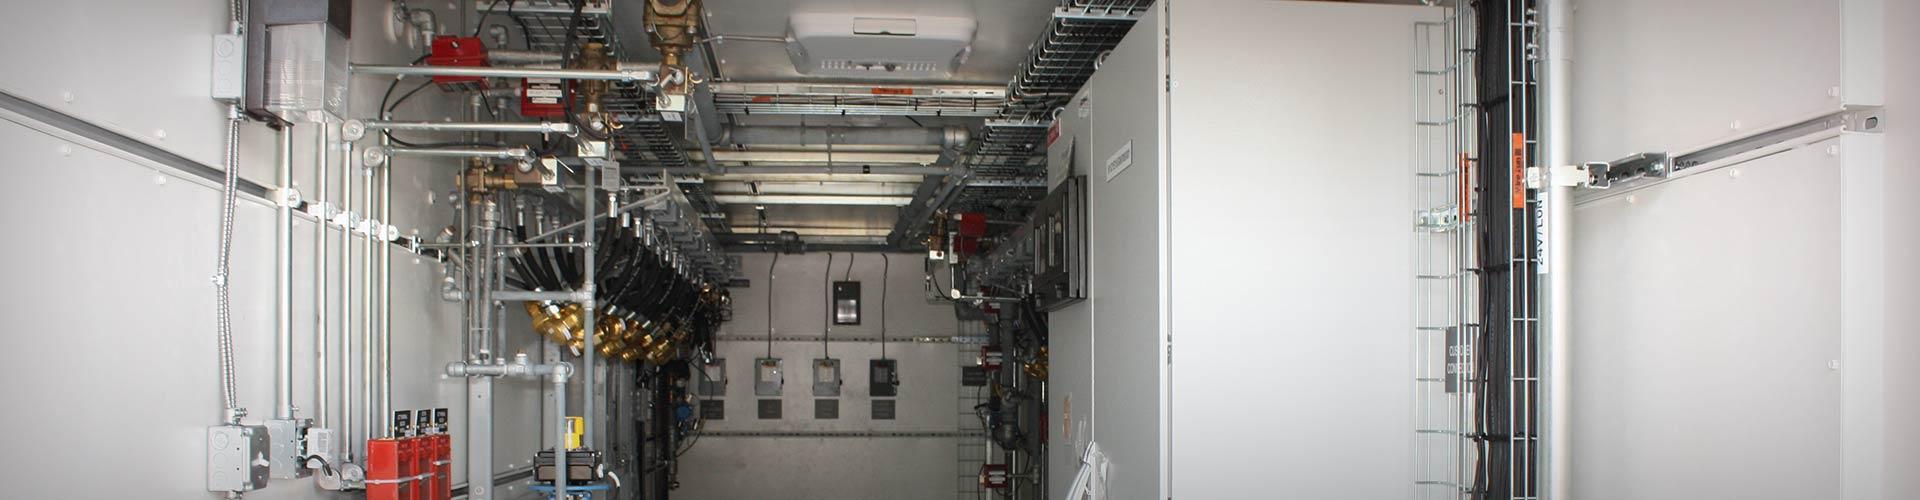 High Pressure CO2 Fire Suppression Systems – American Fire